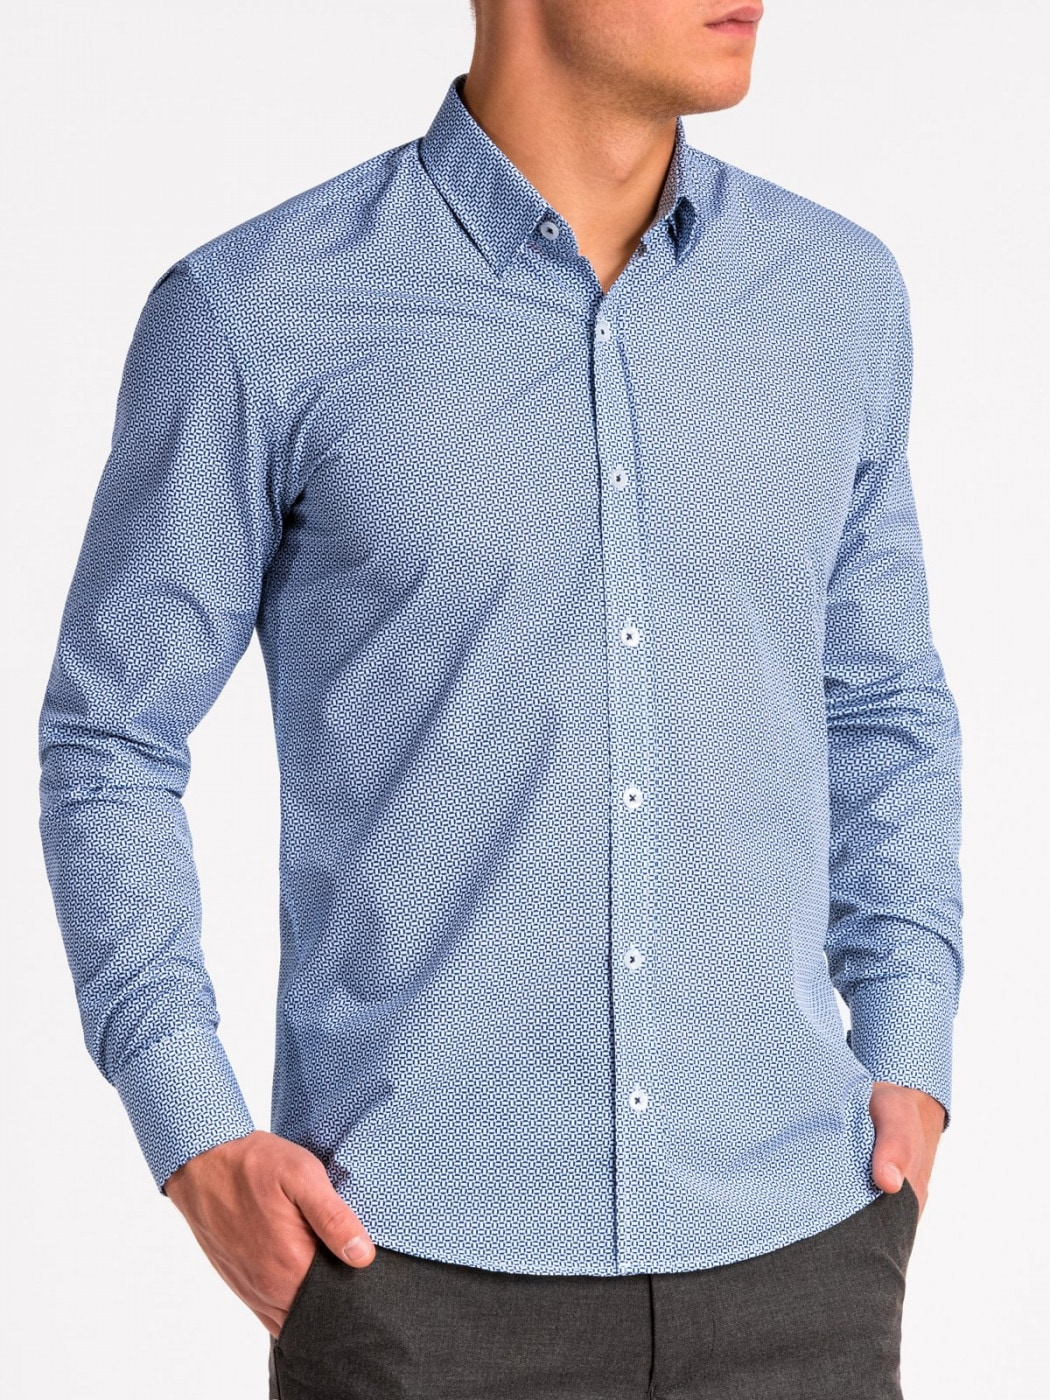 Men's Shirt Ombre K471